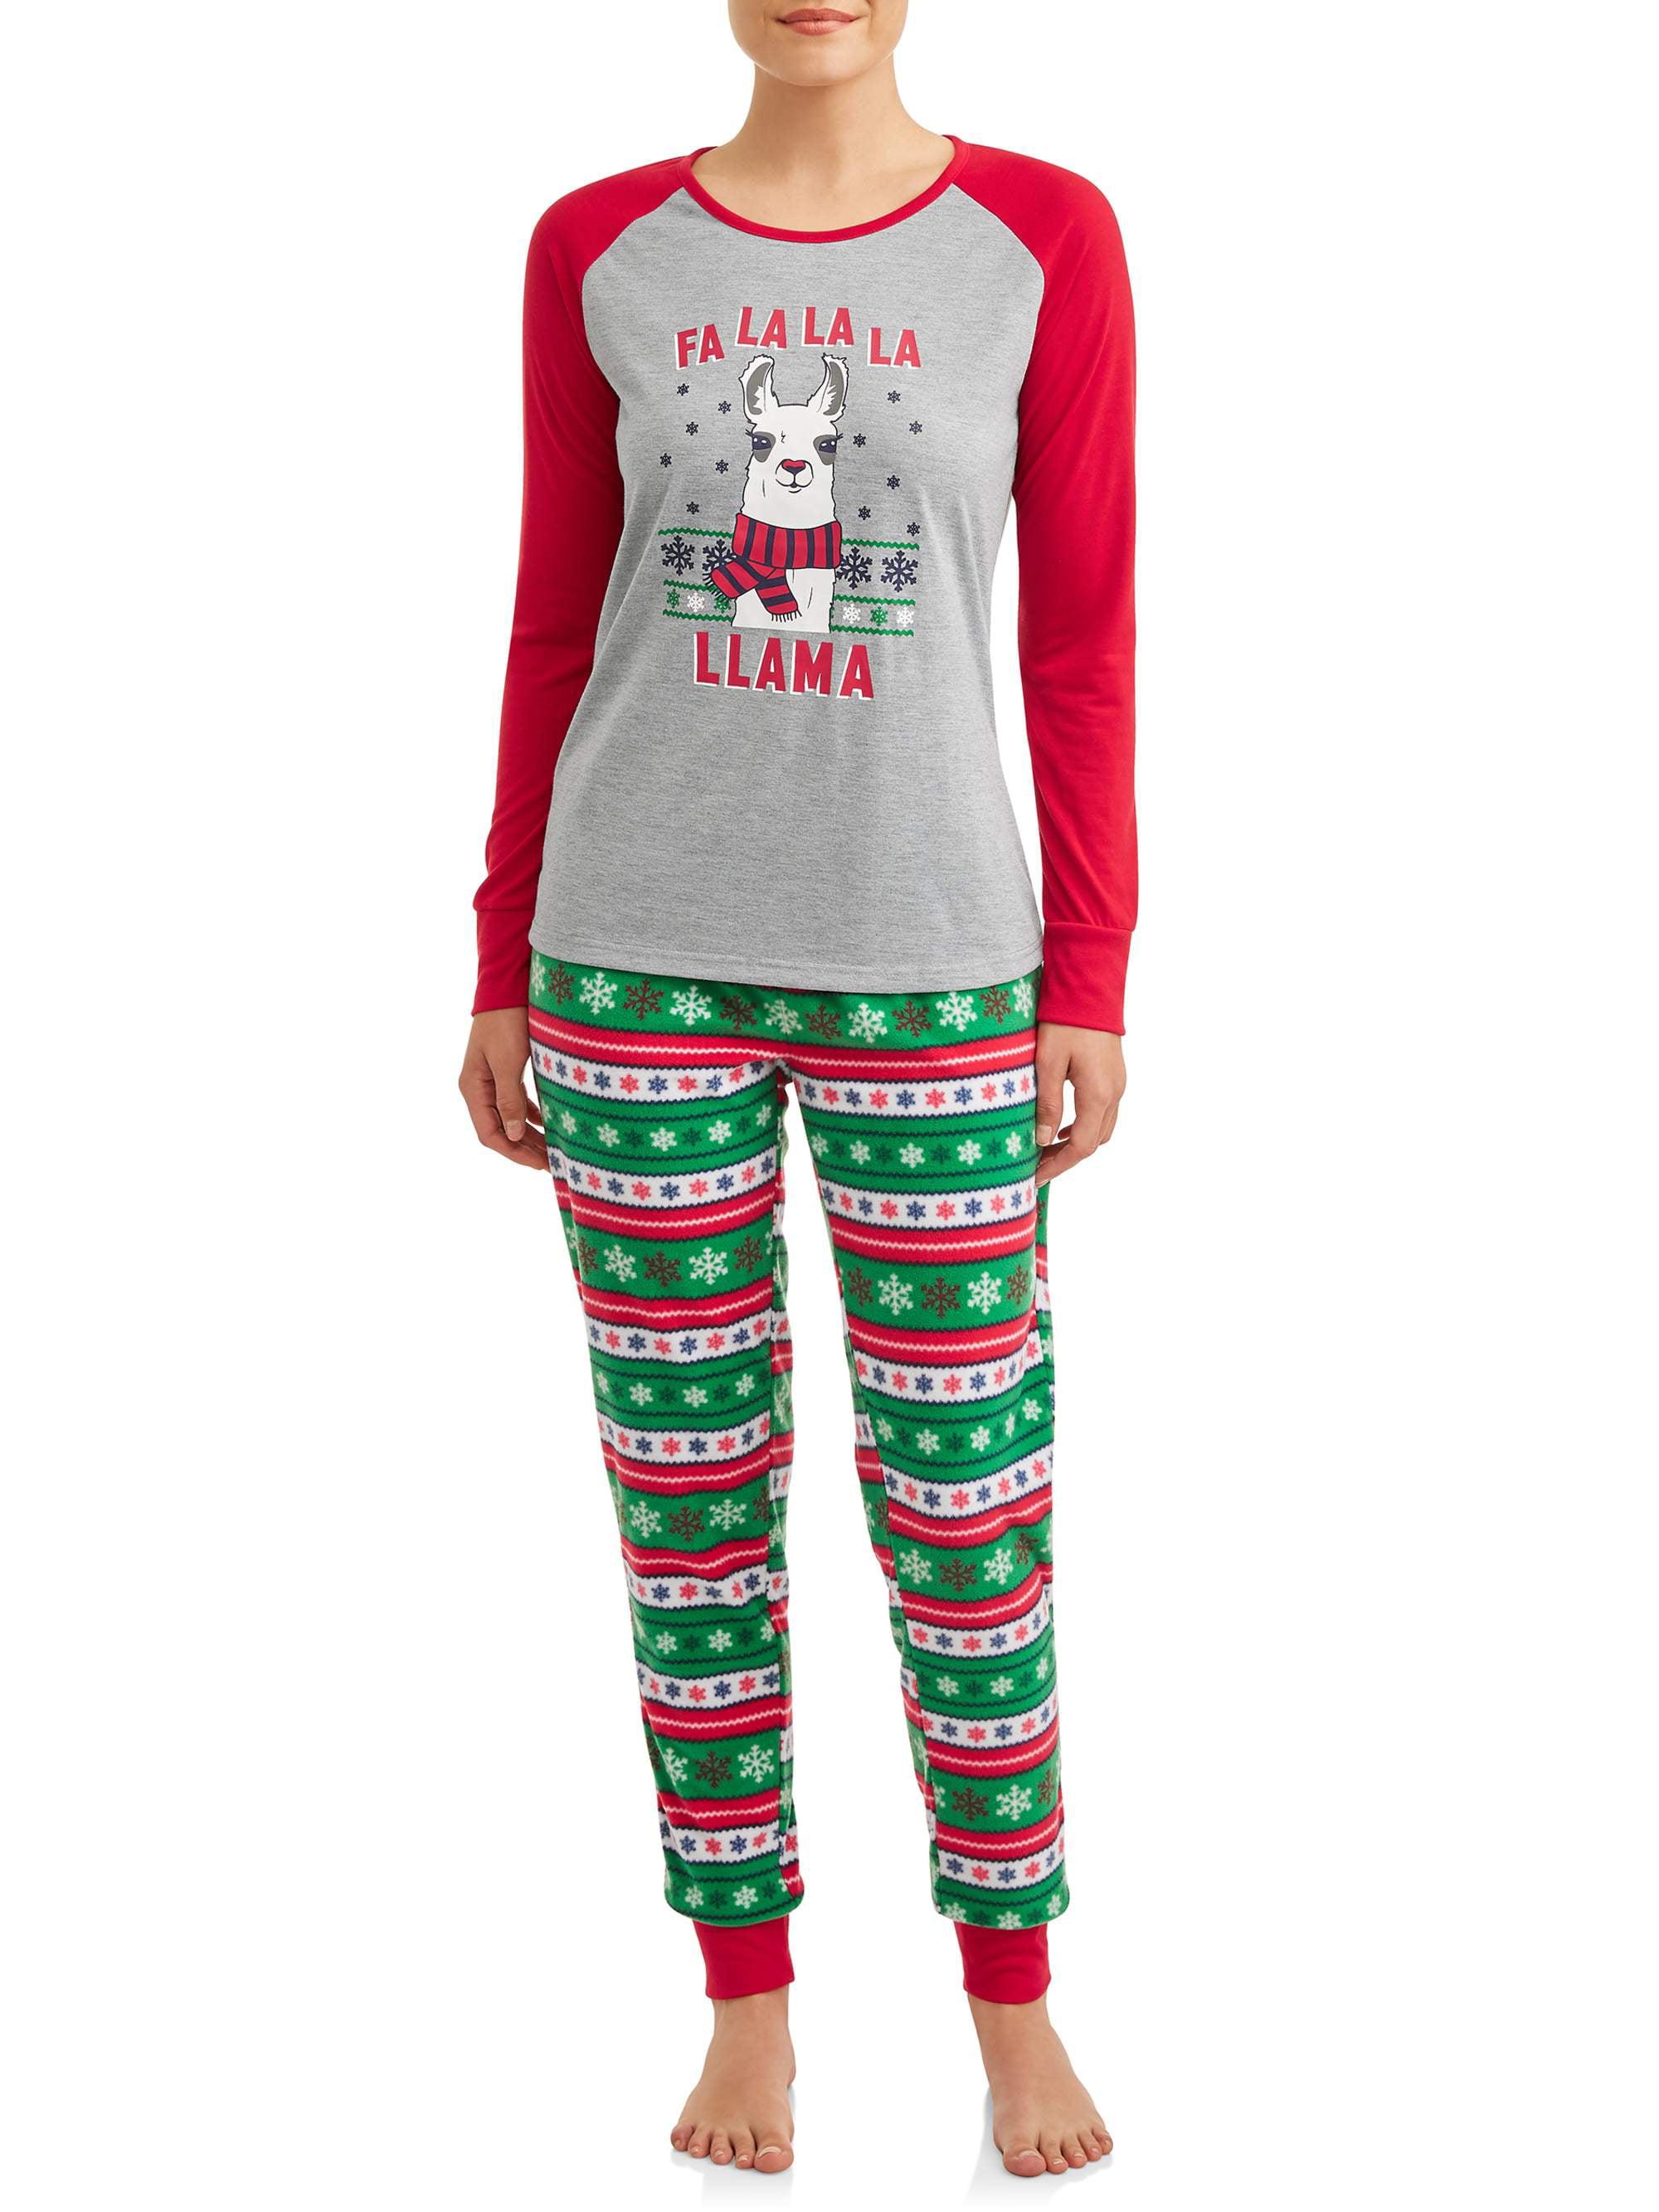 Boys Christmas Holiday Pajama Set Skull Head with headphones